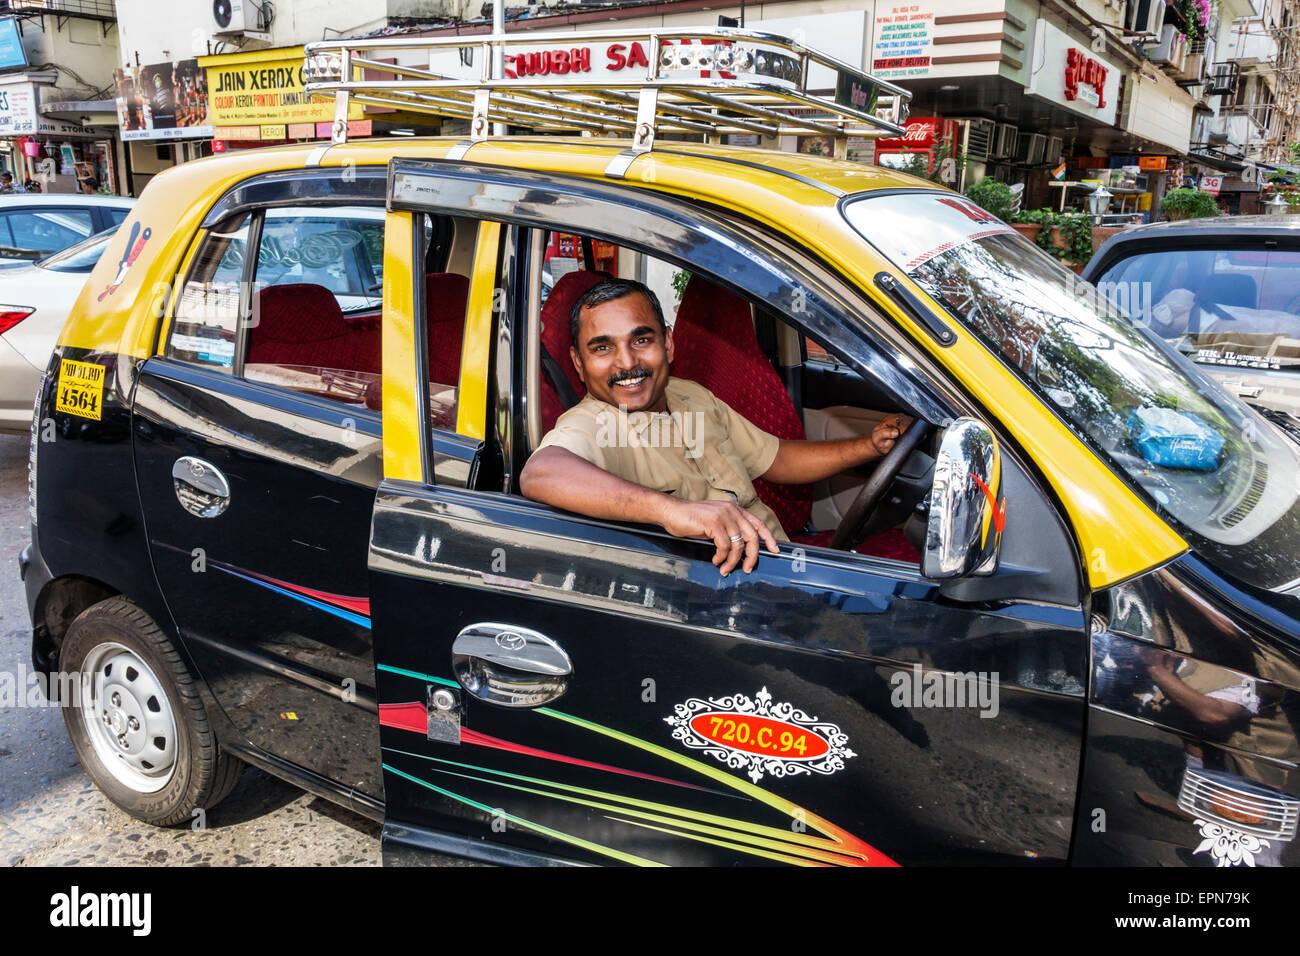 Mumbai India Asian Apollo Bandar Colaba Causeway Market Strand Cinema Road man taxi cab taxis cabs driver job - Stock Image